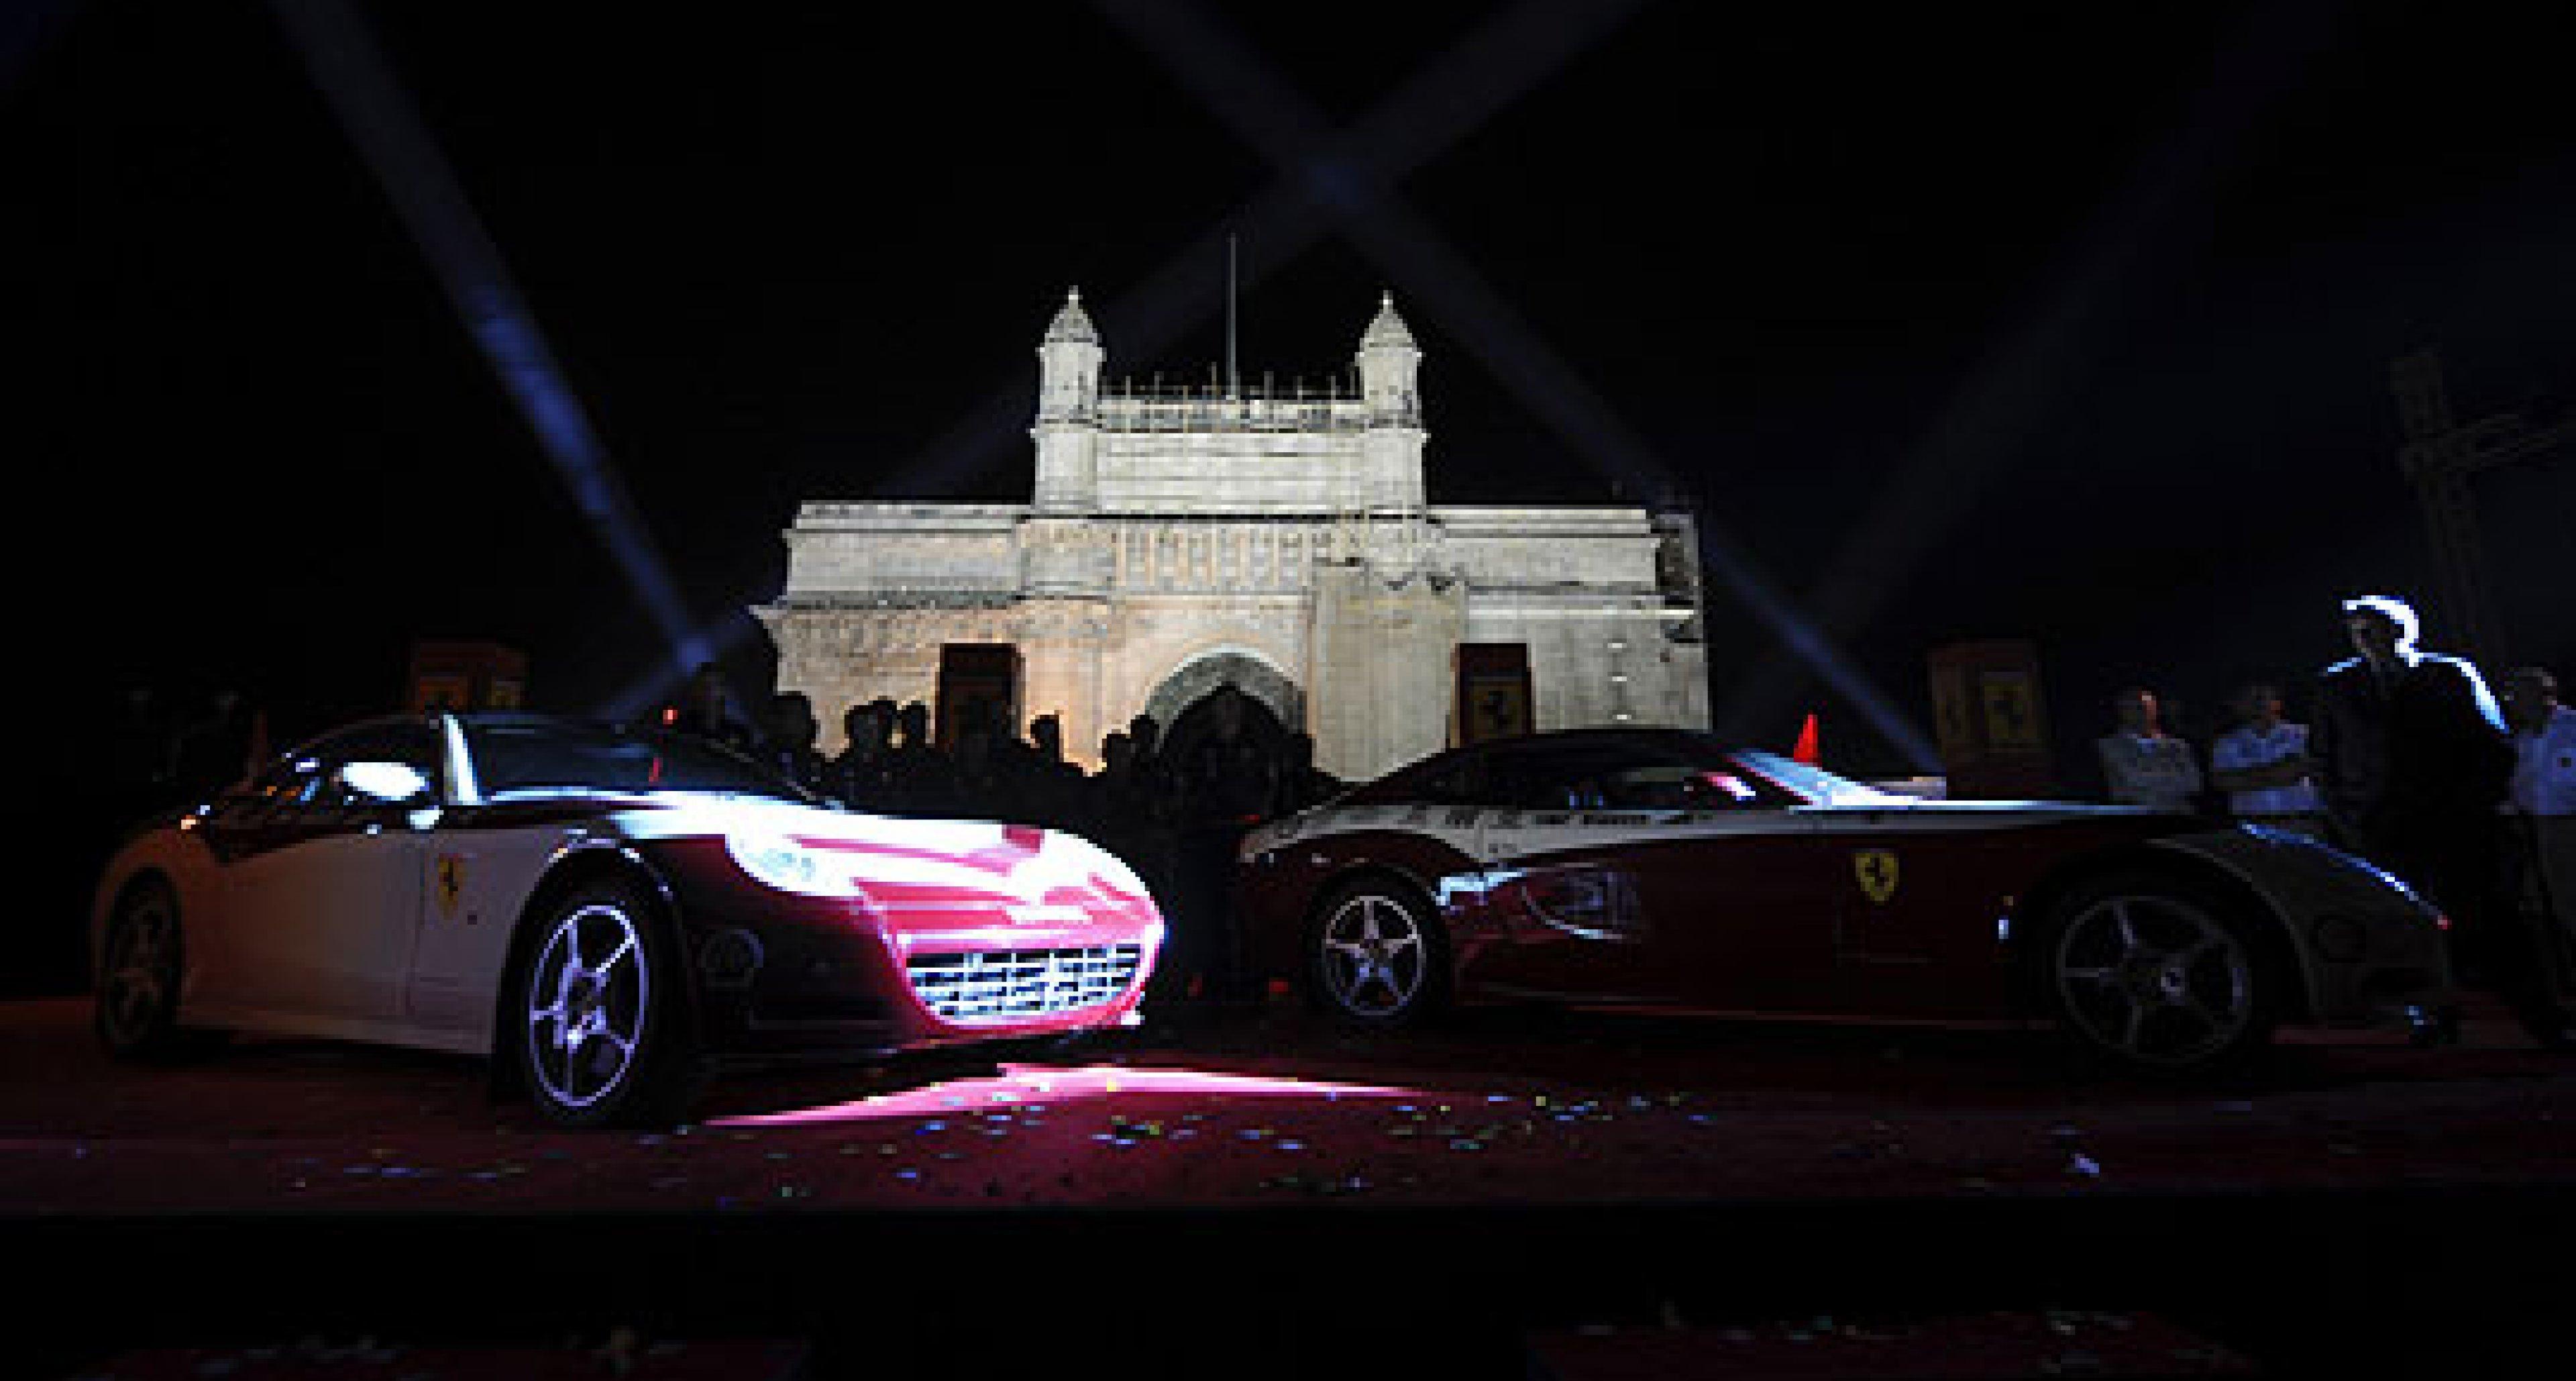 Ferrari Tour Returns to Mumbai